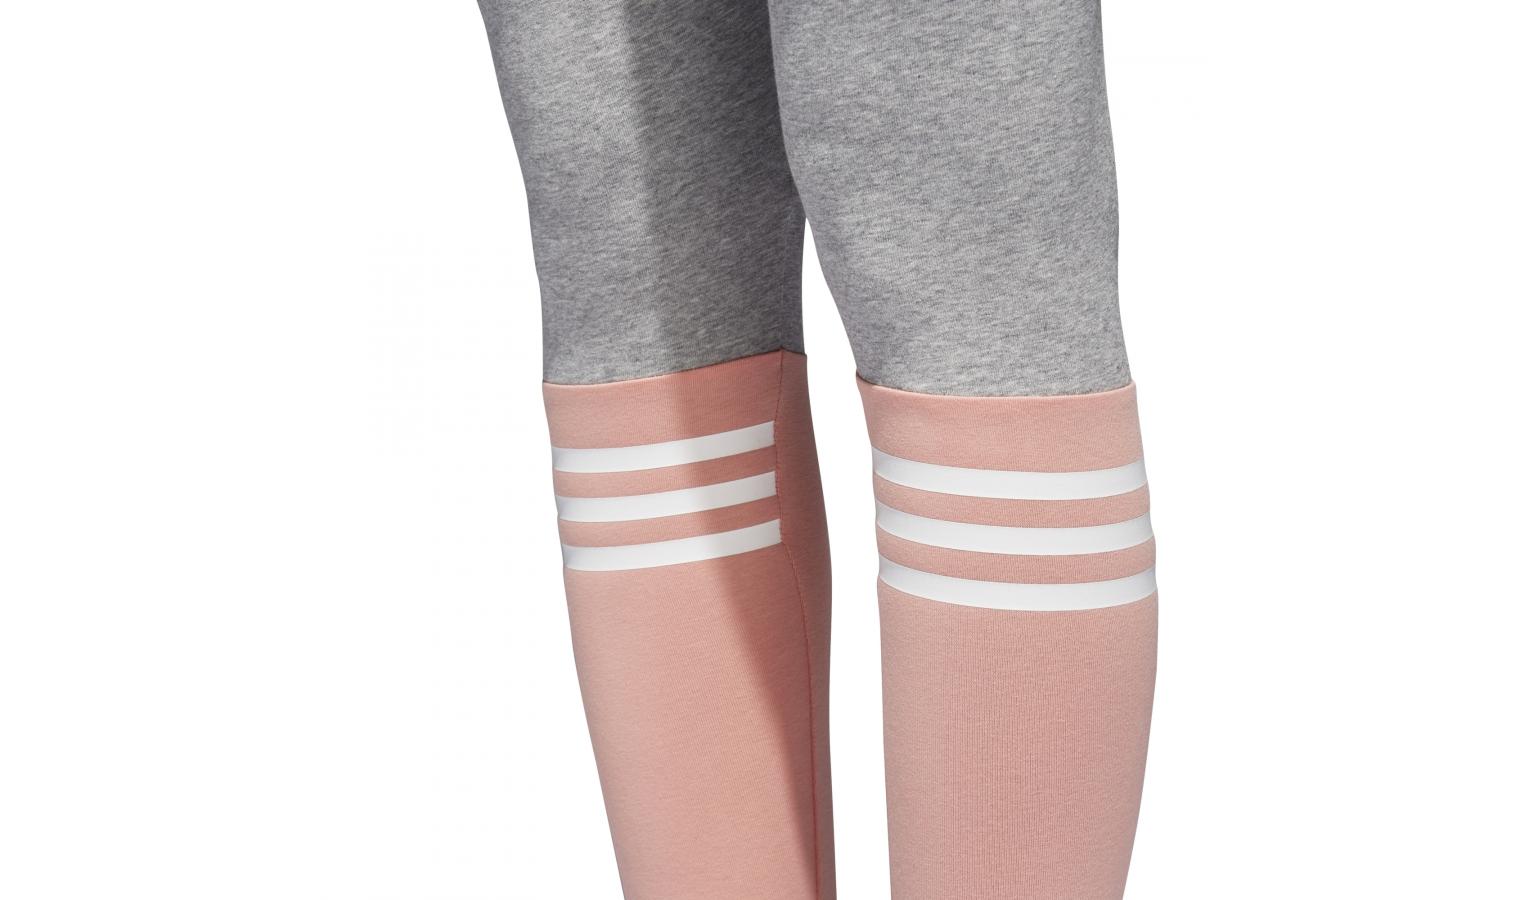 Dámske športové legíny adidas W SID TIGHT W sivé  1bde601719